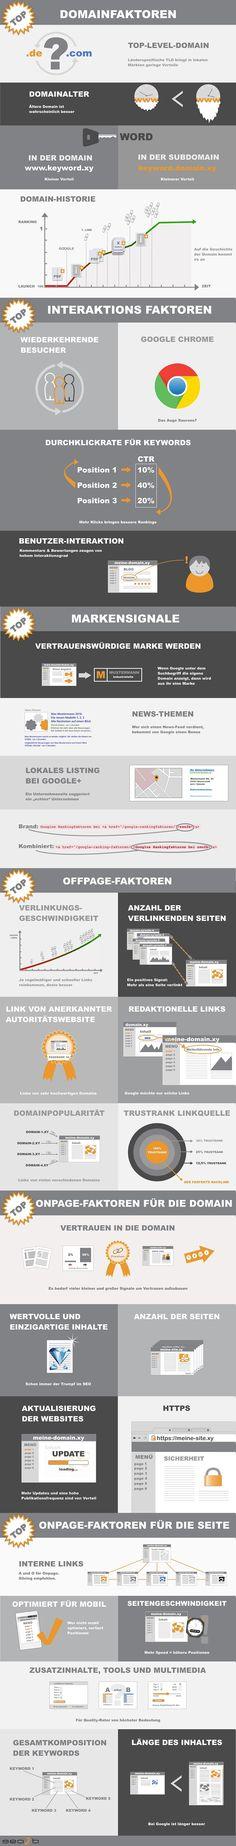 © seo2b - Infografik - Meta-Studie